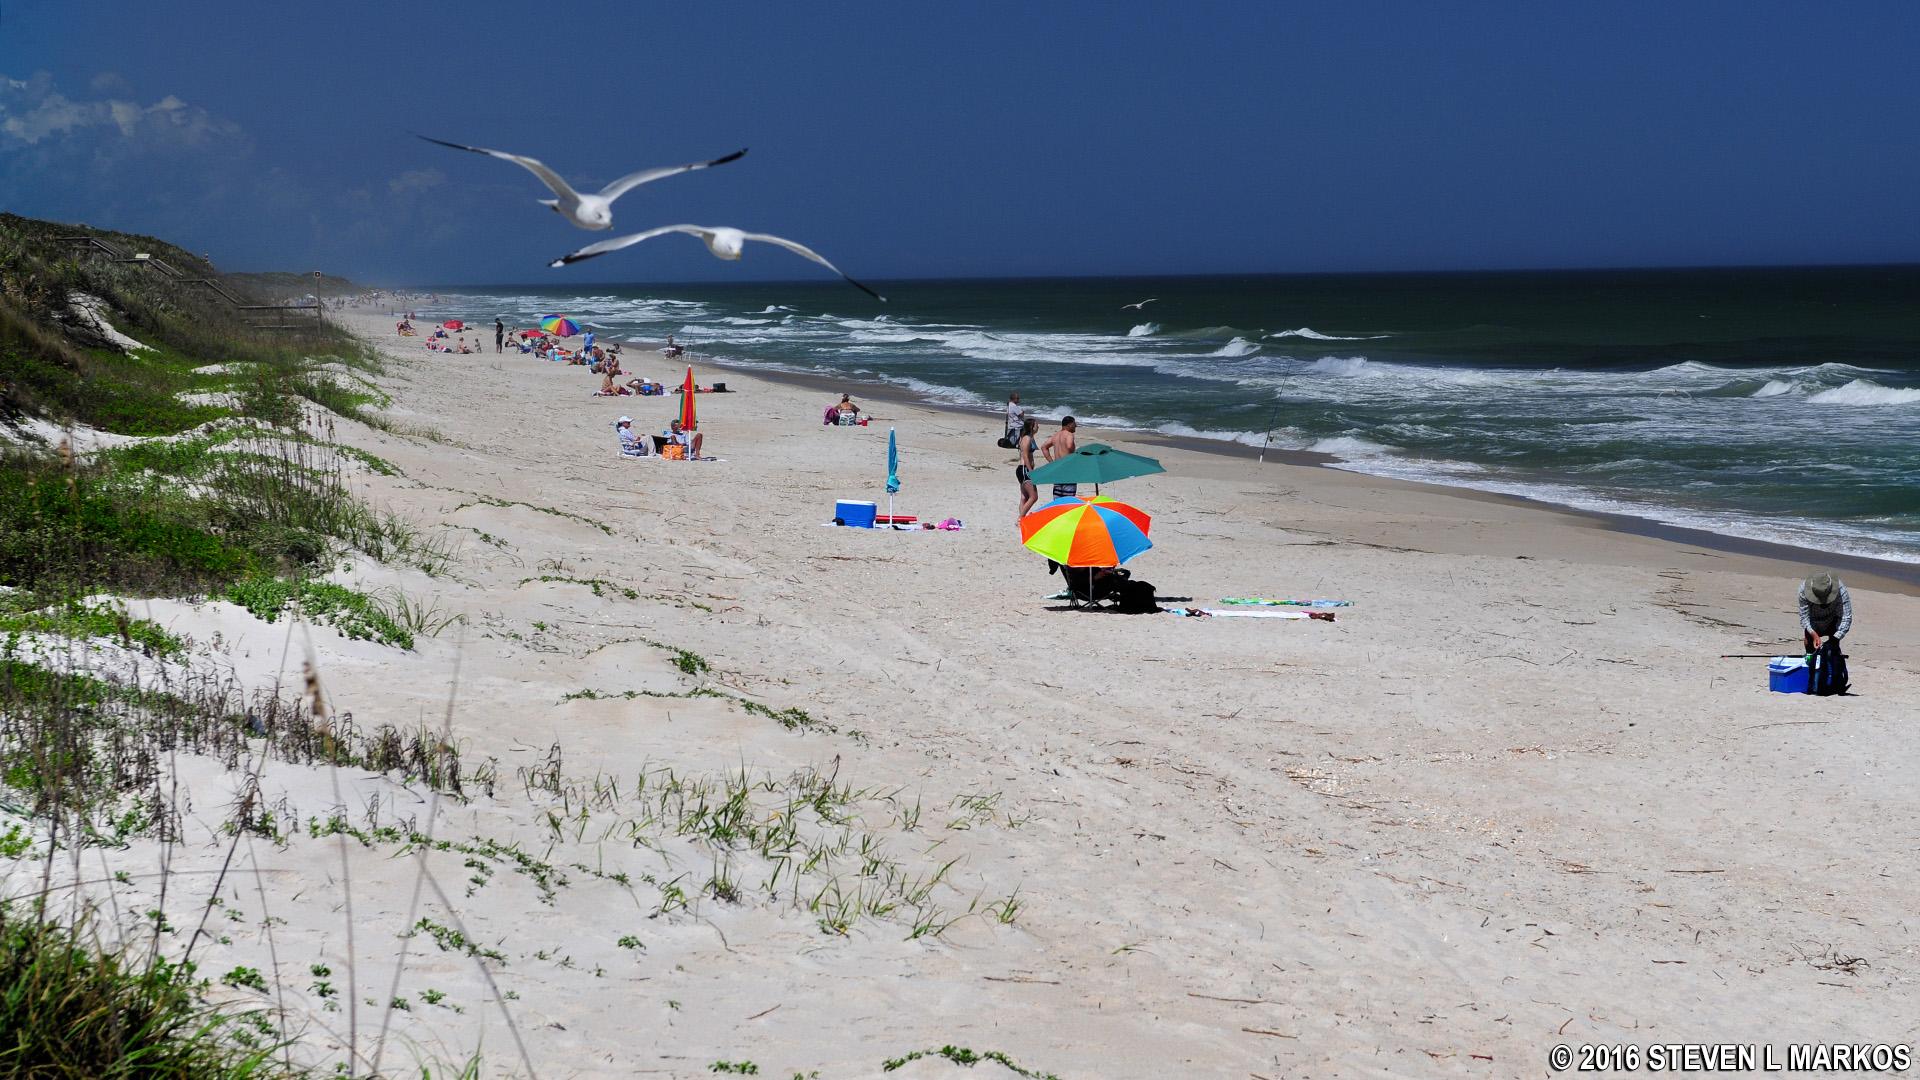 Canaveral National Seas Beaches